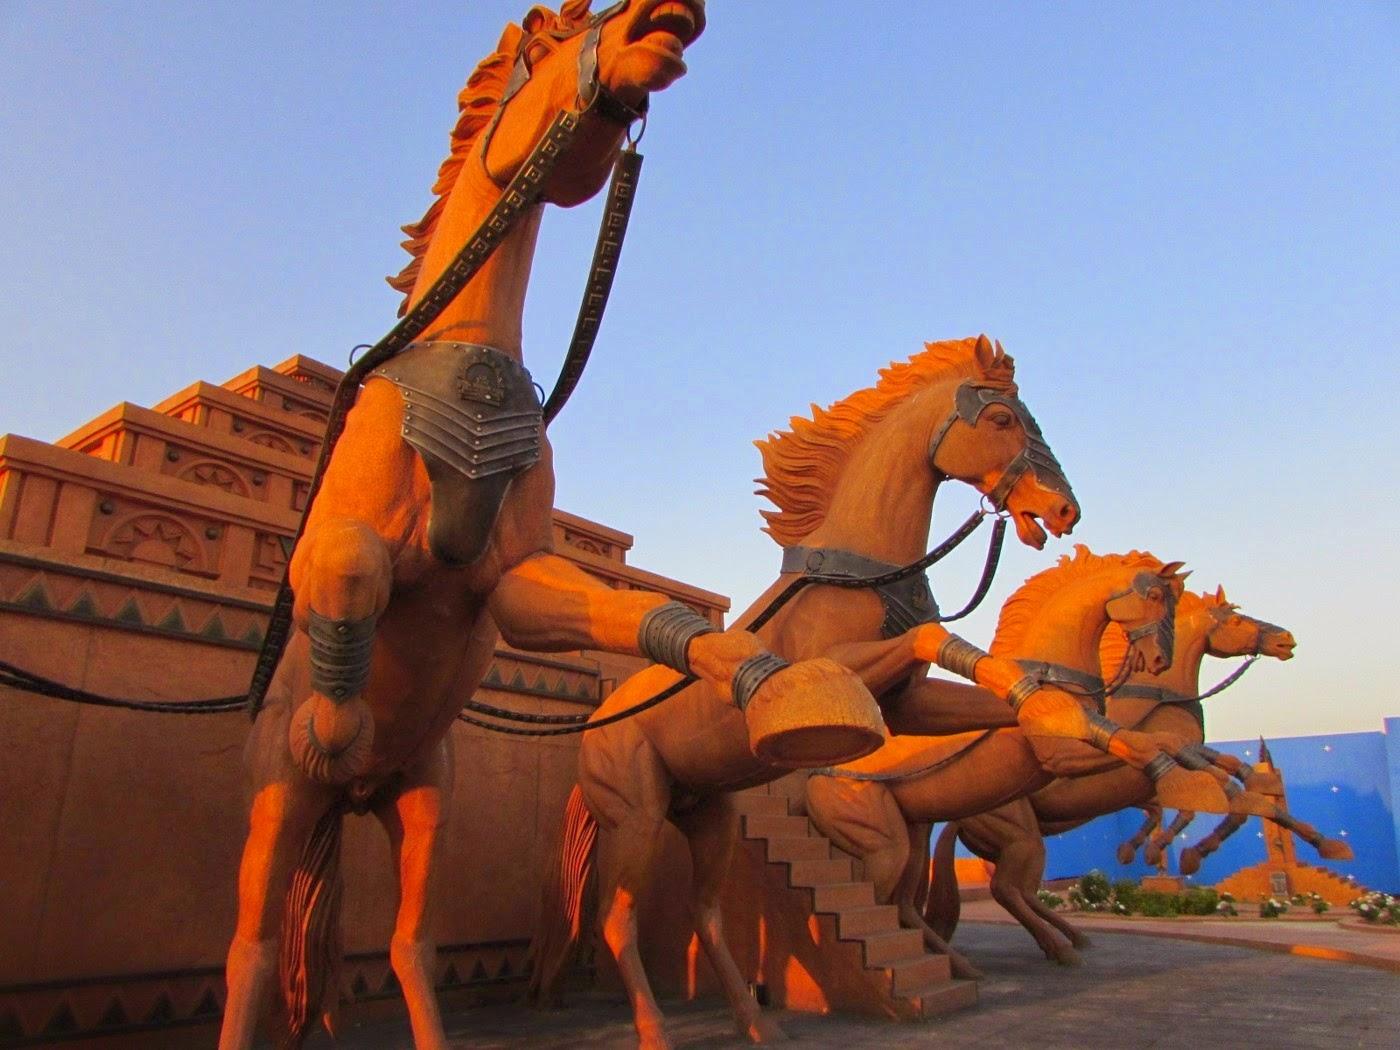 Baahubali Sets - The World Of Baahubali Sneak Peak HD images | Rajamouli | Prabhas | Anushka